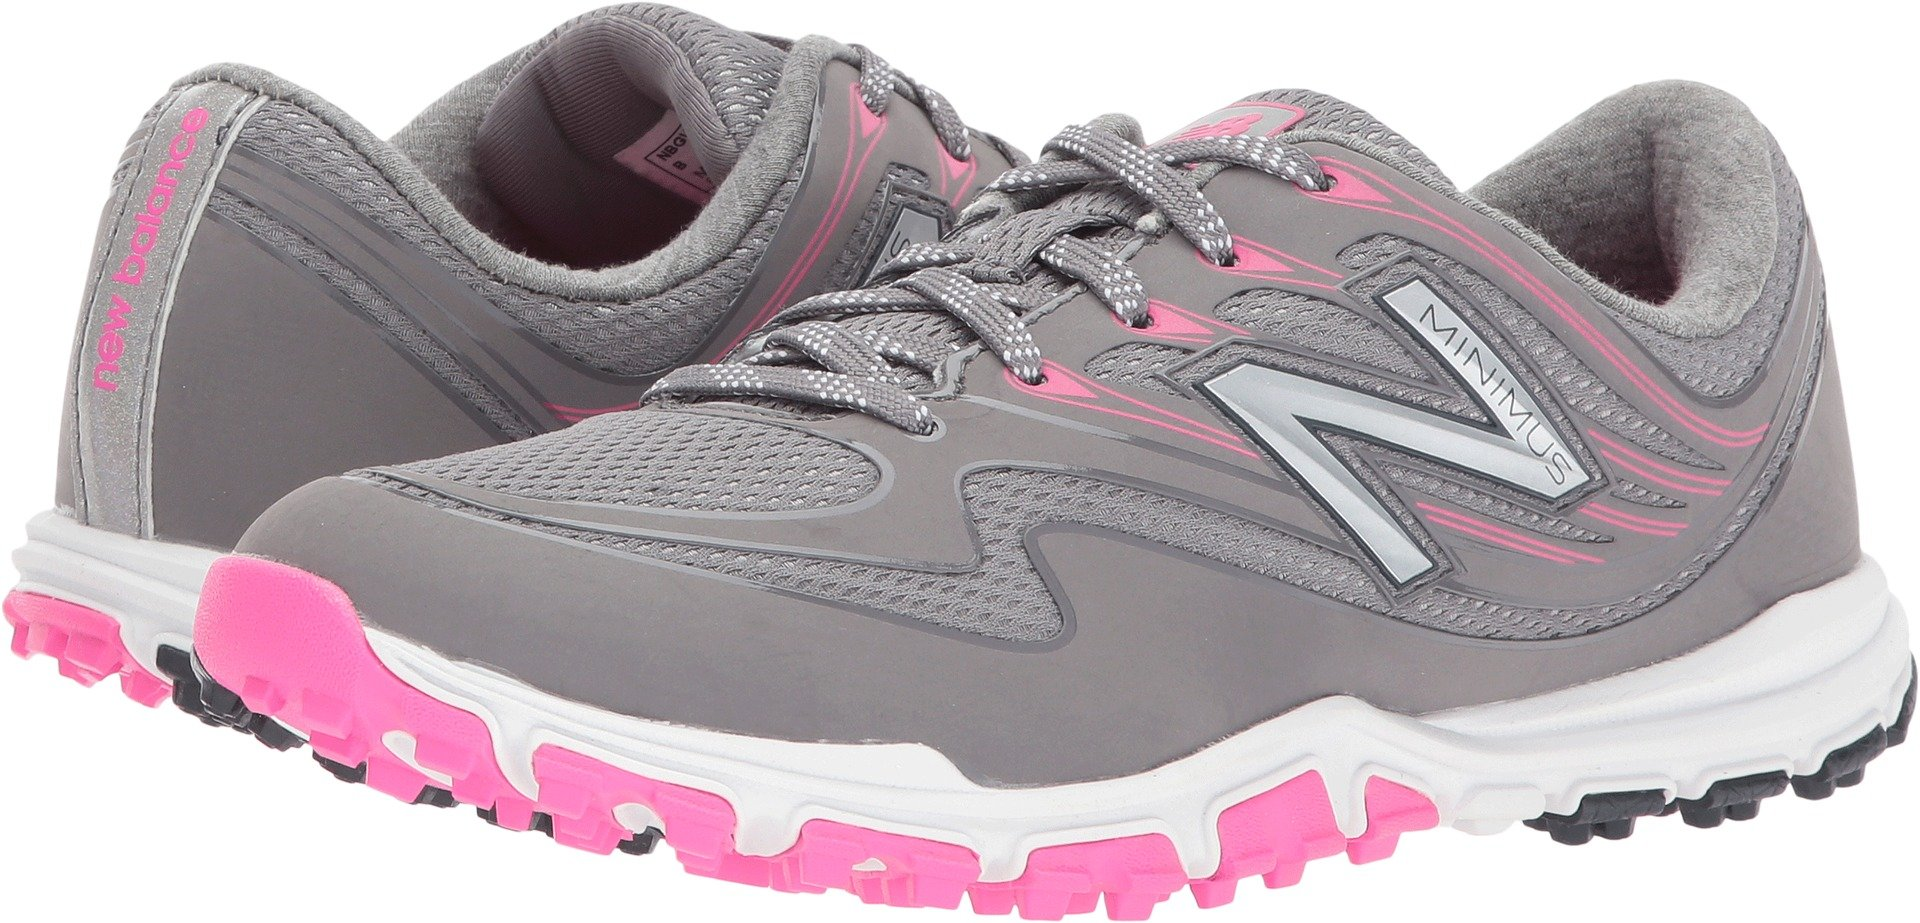 New Balance Women's Minimus Sport Golf Shoe, Pink/Grey, 8.5 B B US